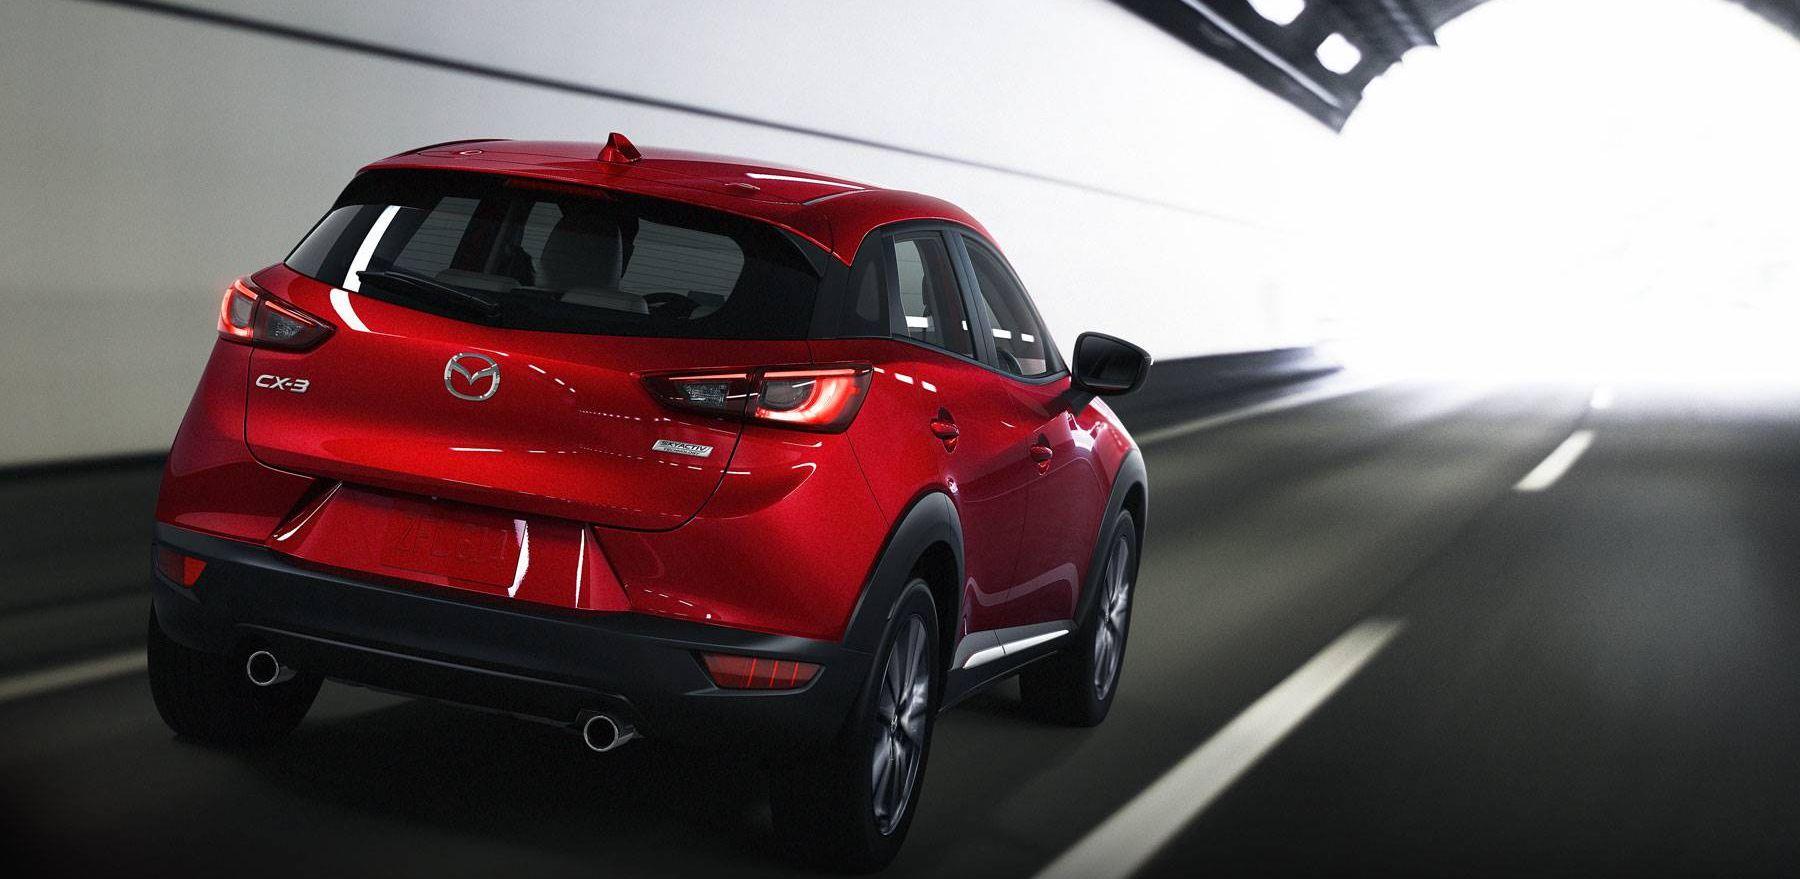 Mazda Cx 3 Lease >> 2018 Mazda Cx 3 Leasing Near Sacramento Ca Mazda Of Elk Grove